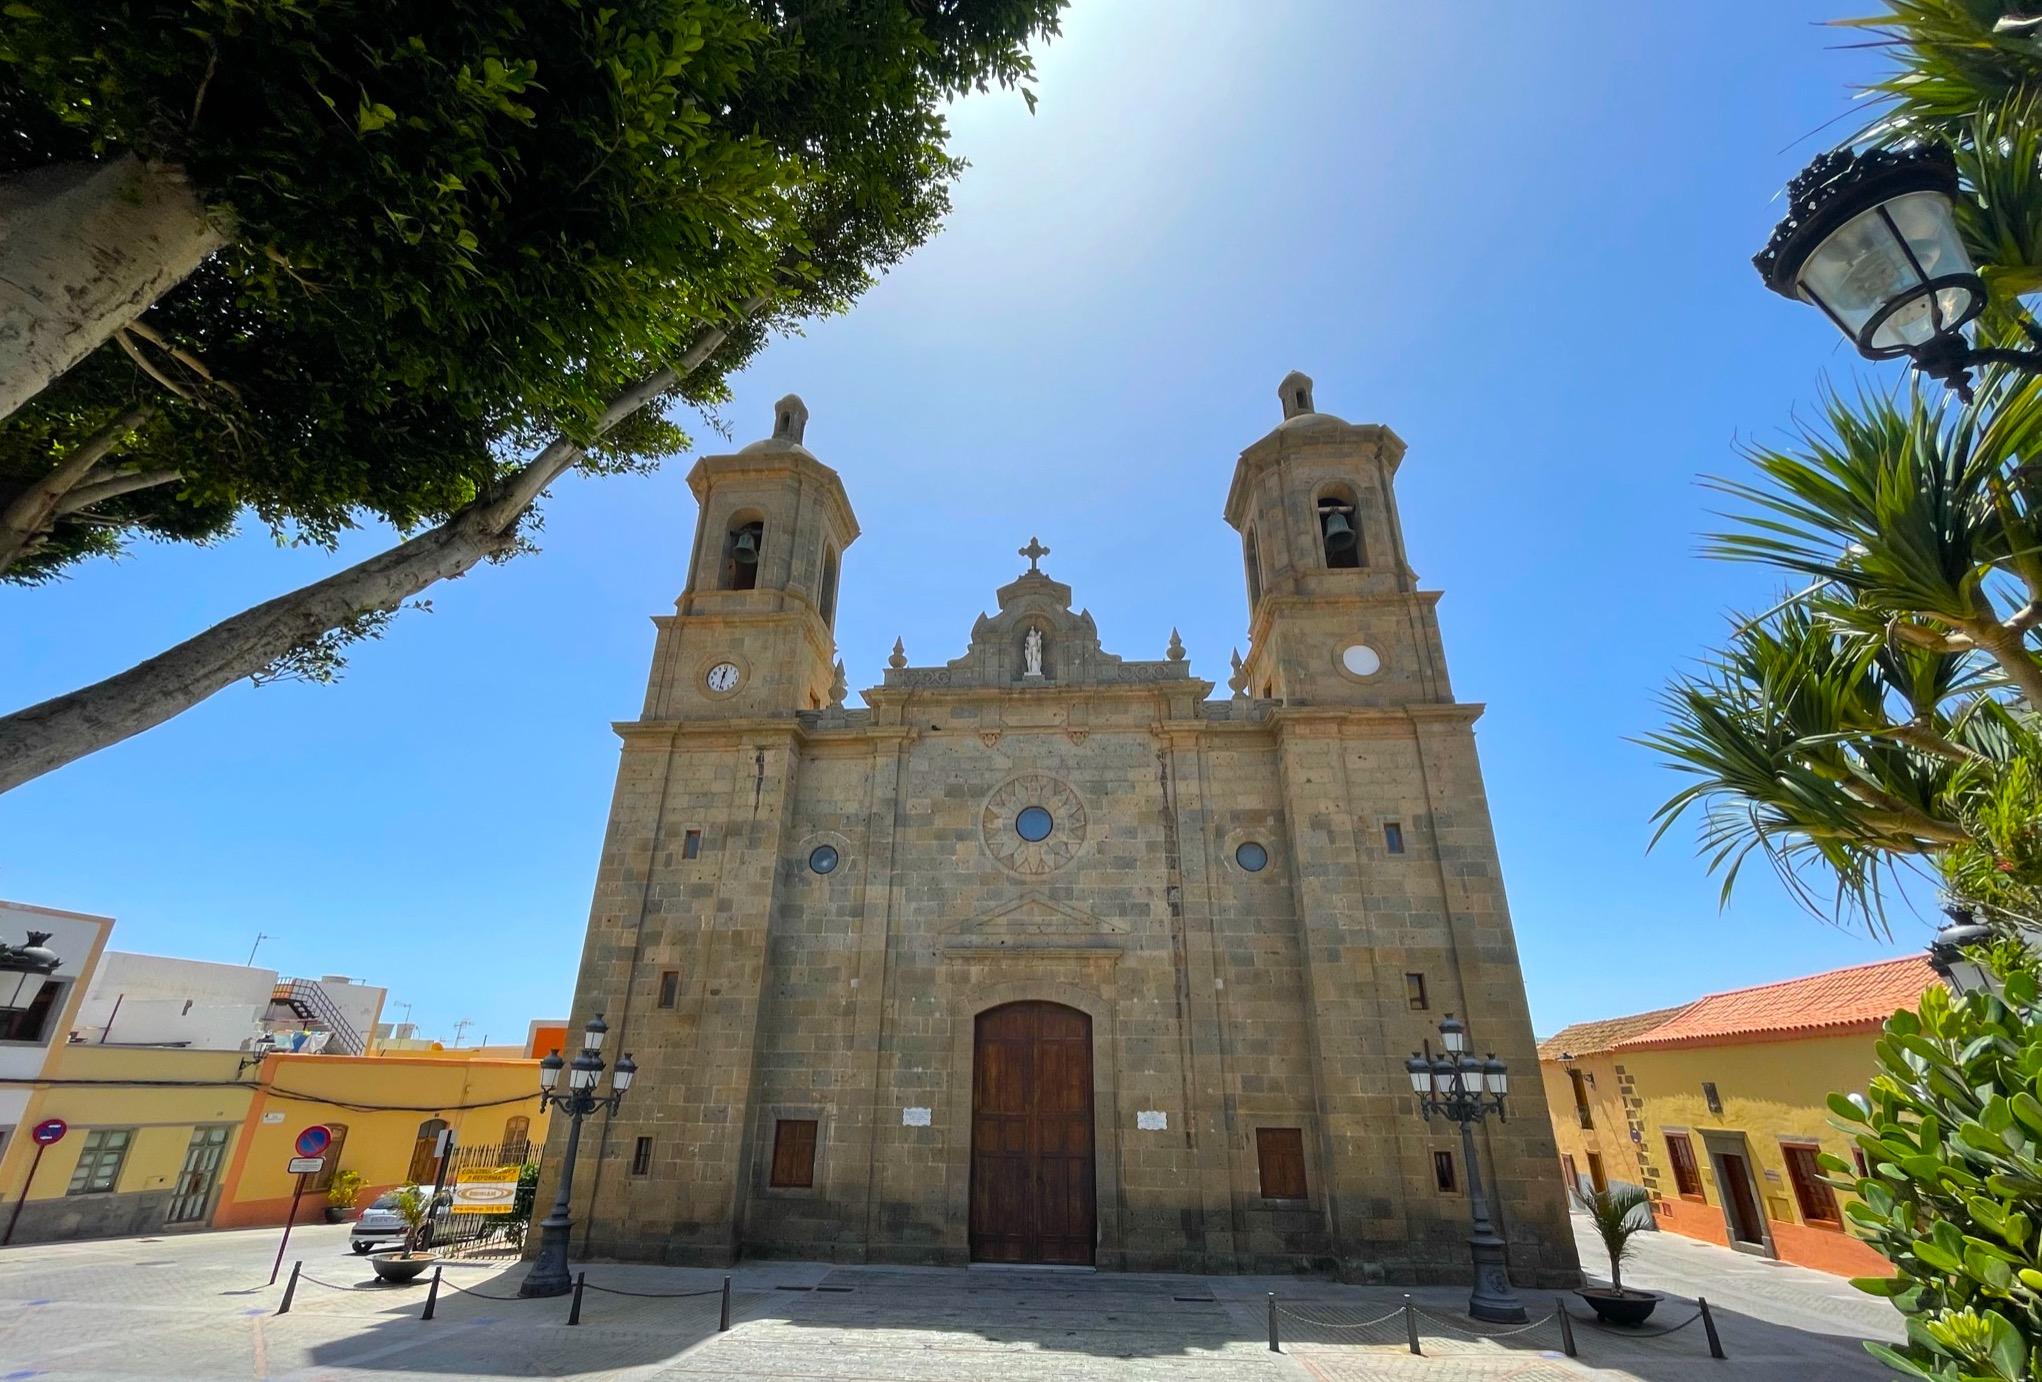 Kirchplatz und Kathedrale in Agüimes, Gran Canaria